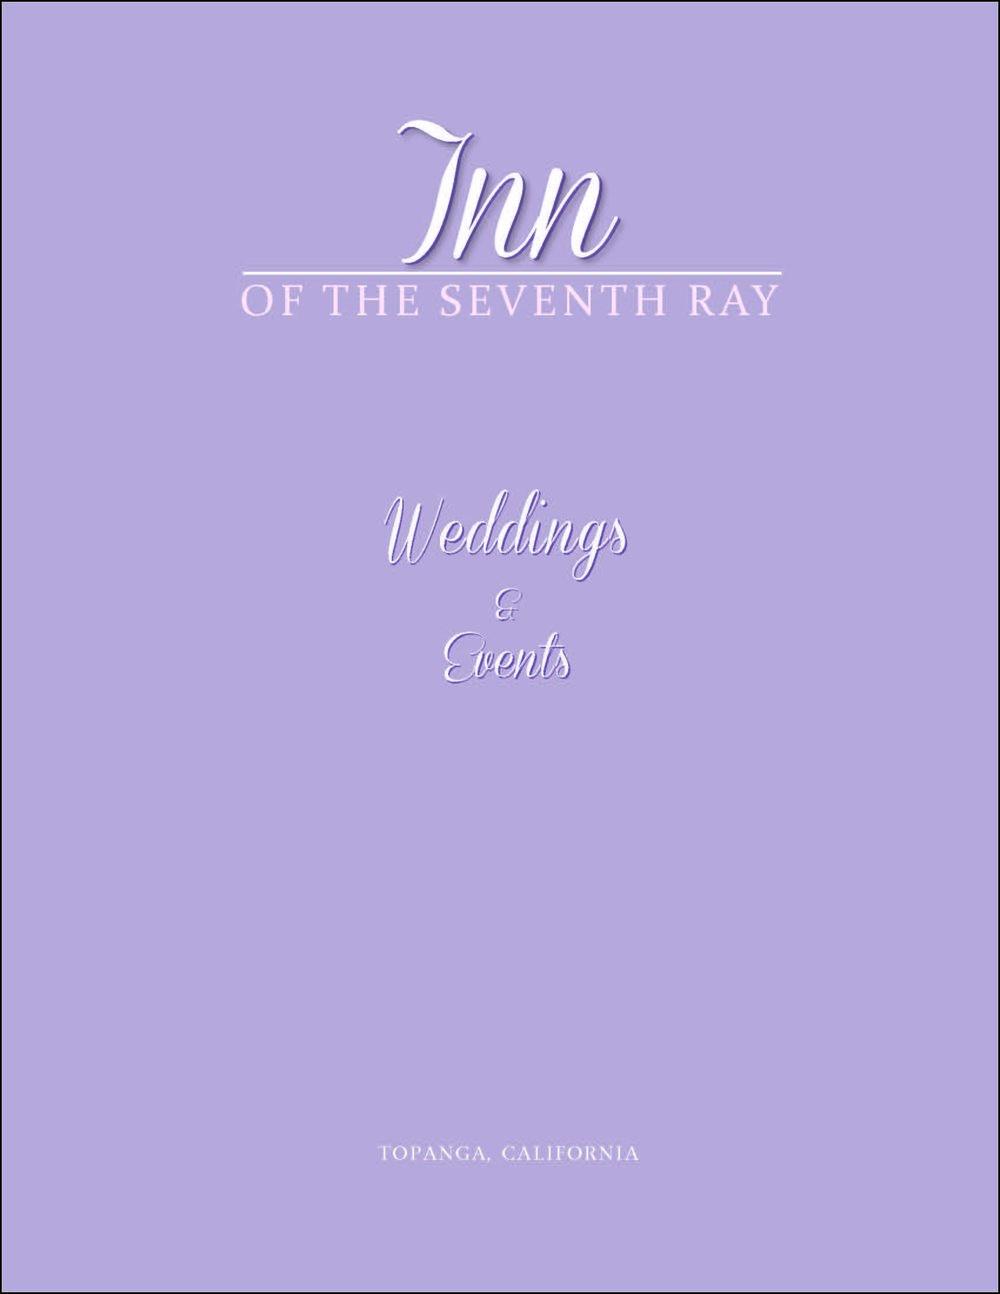 WEDDINGS & EVENTS MENU   DOWNLOAD PDF